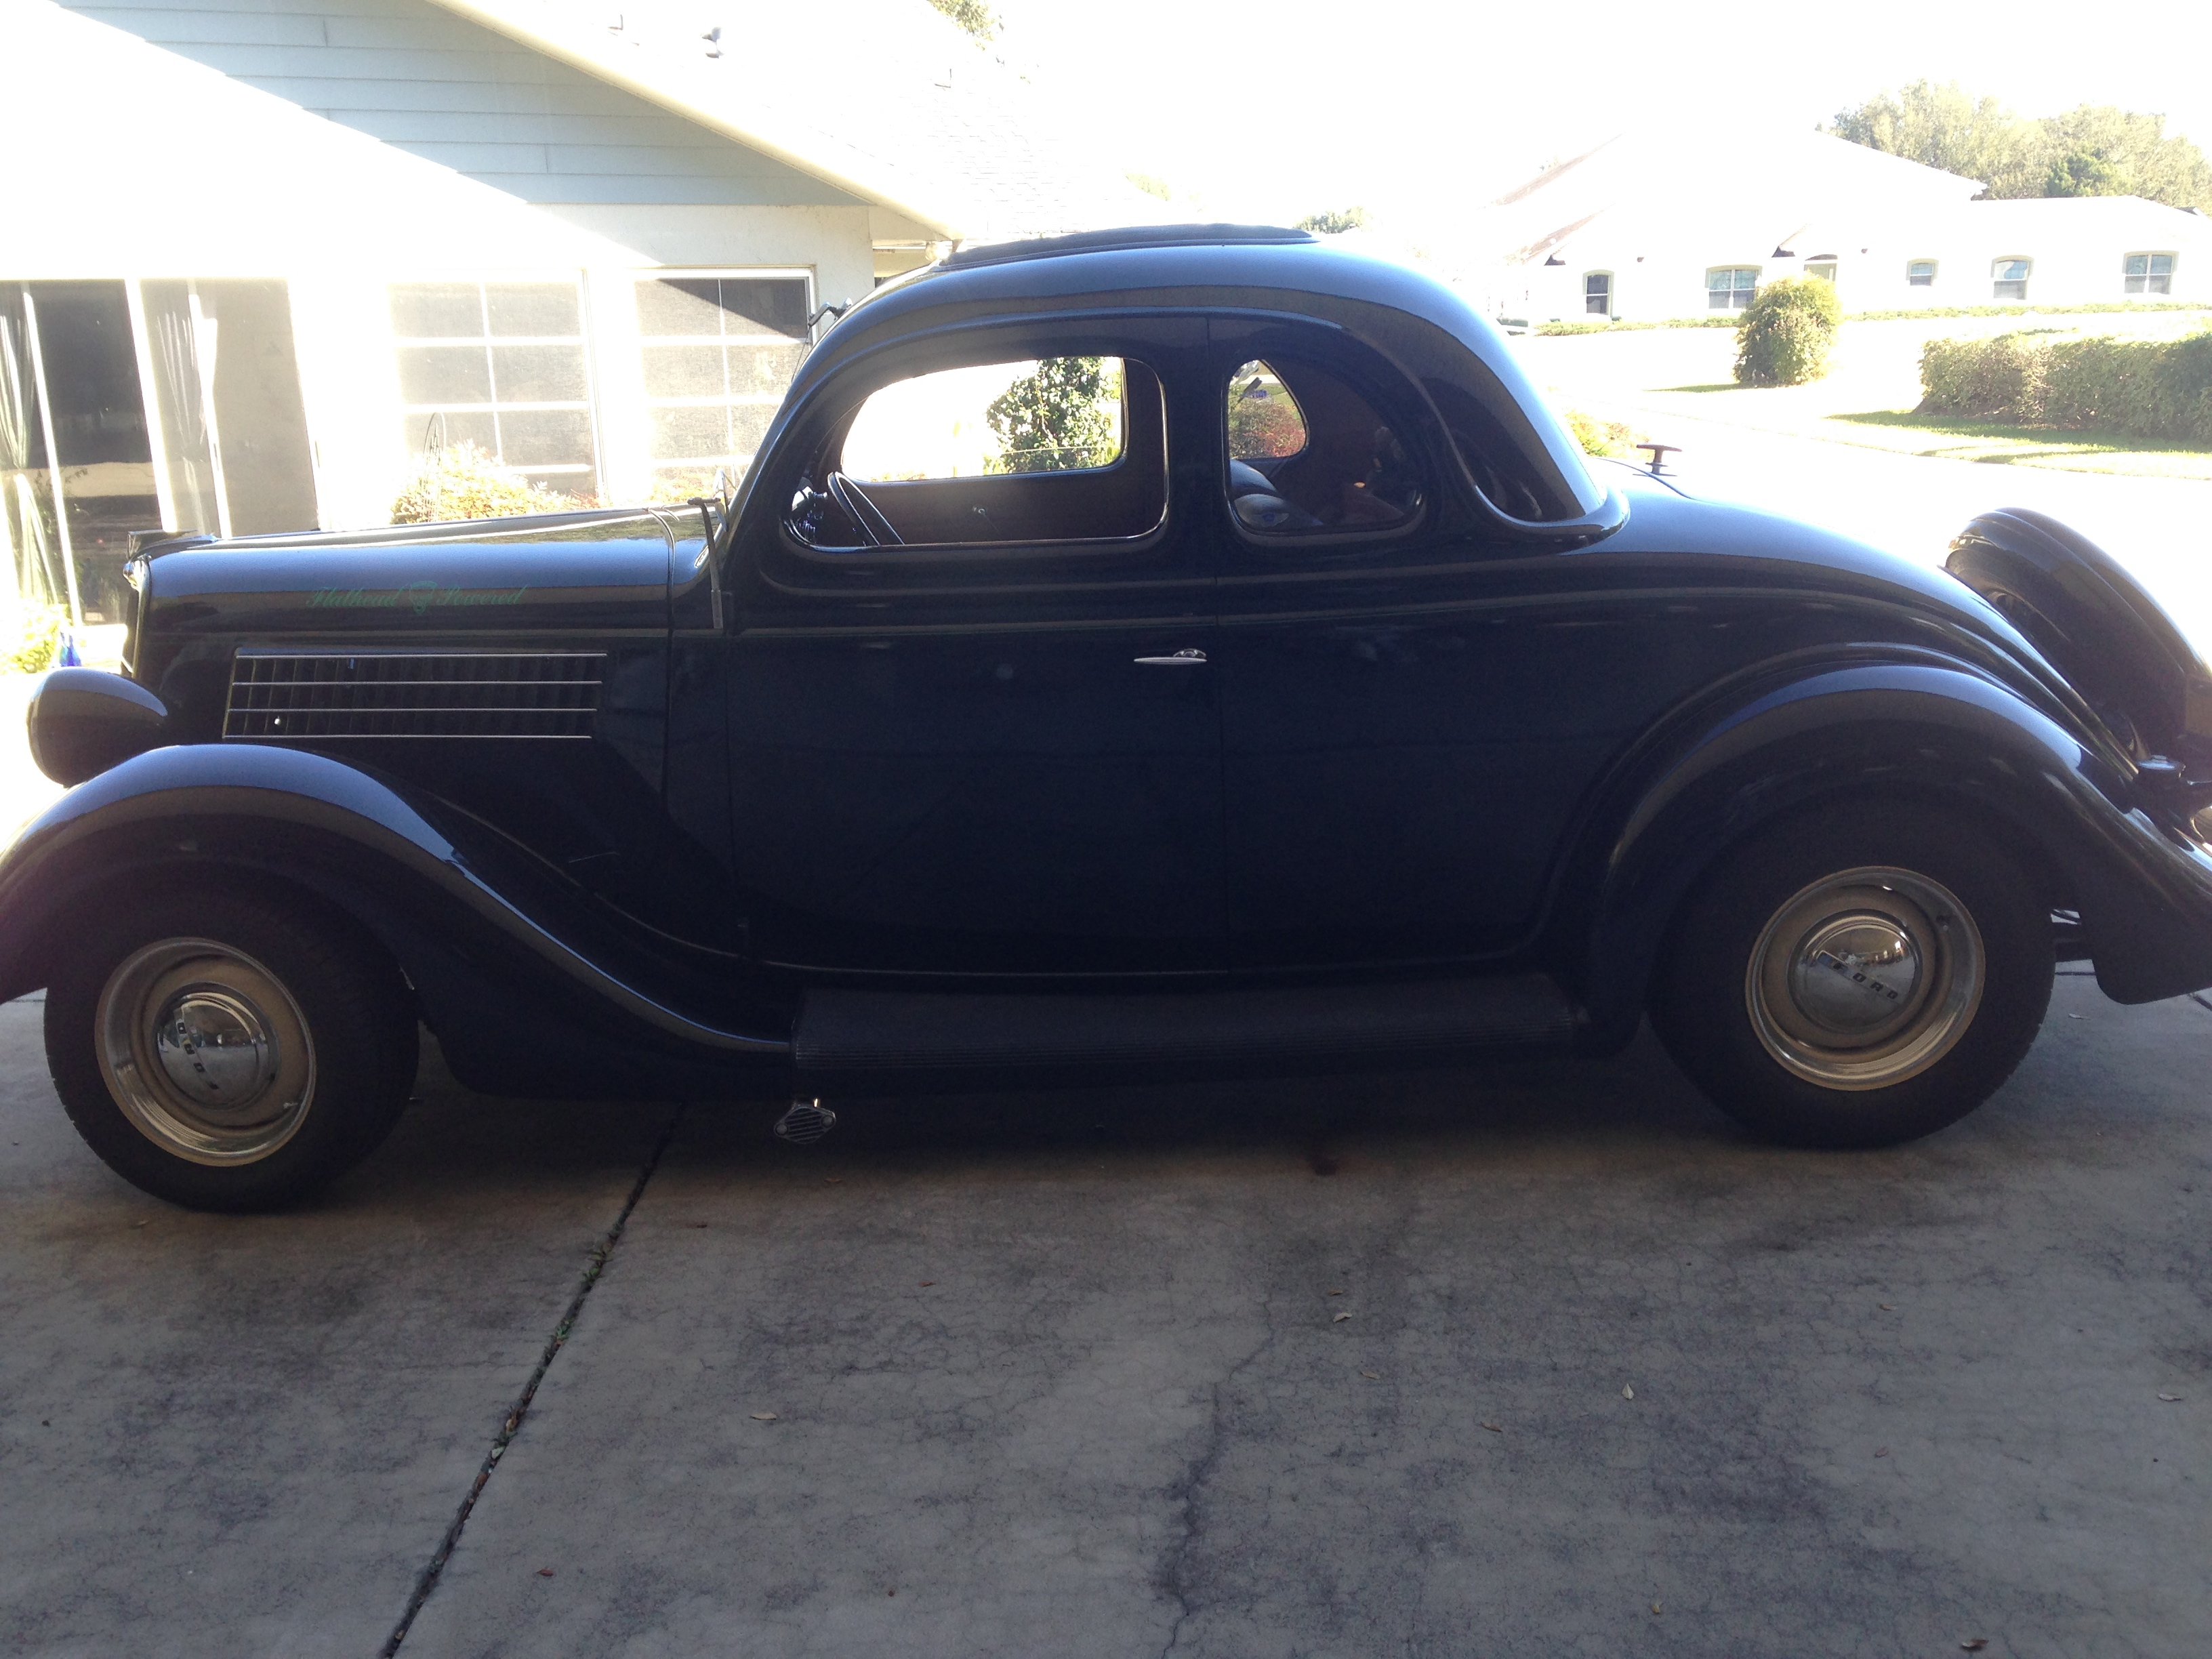 Ralphs Car